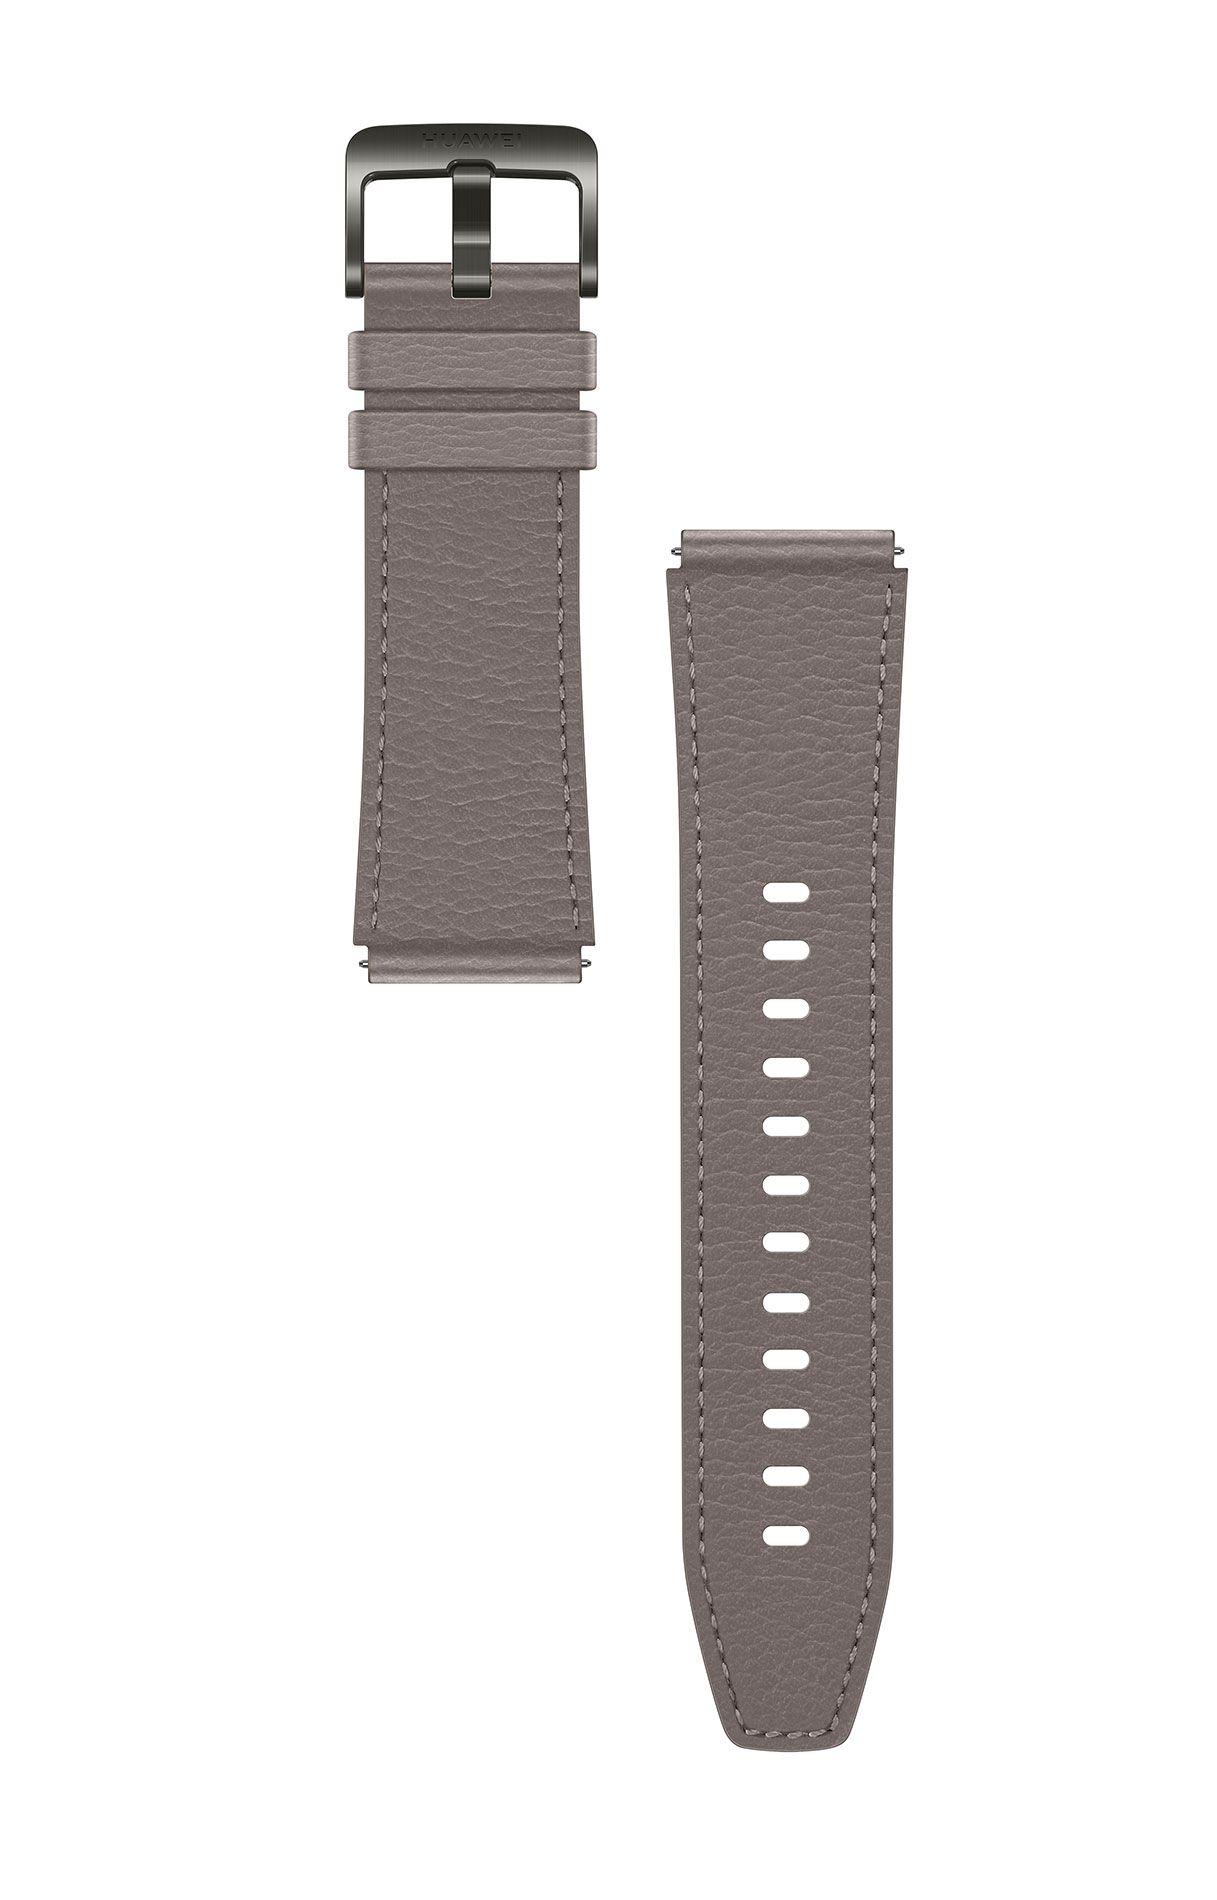 В Казахстане стартовали продажи Huawei Watch GT2 Pro 511432 - Kapital.kz